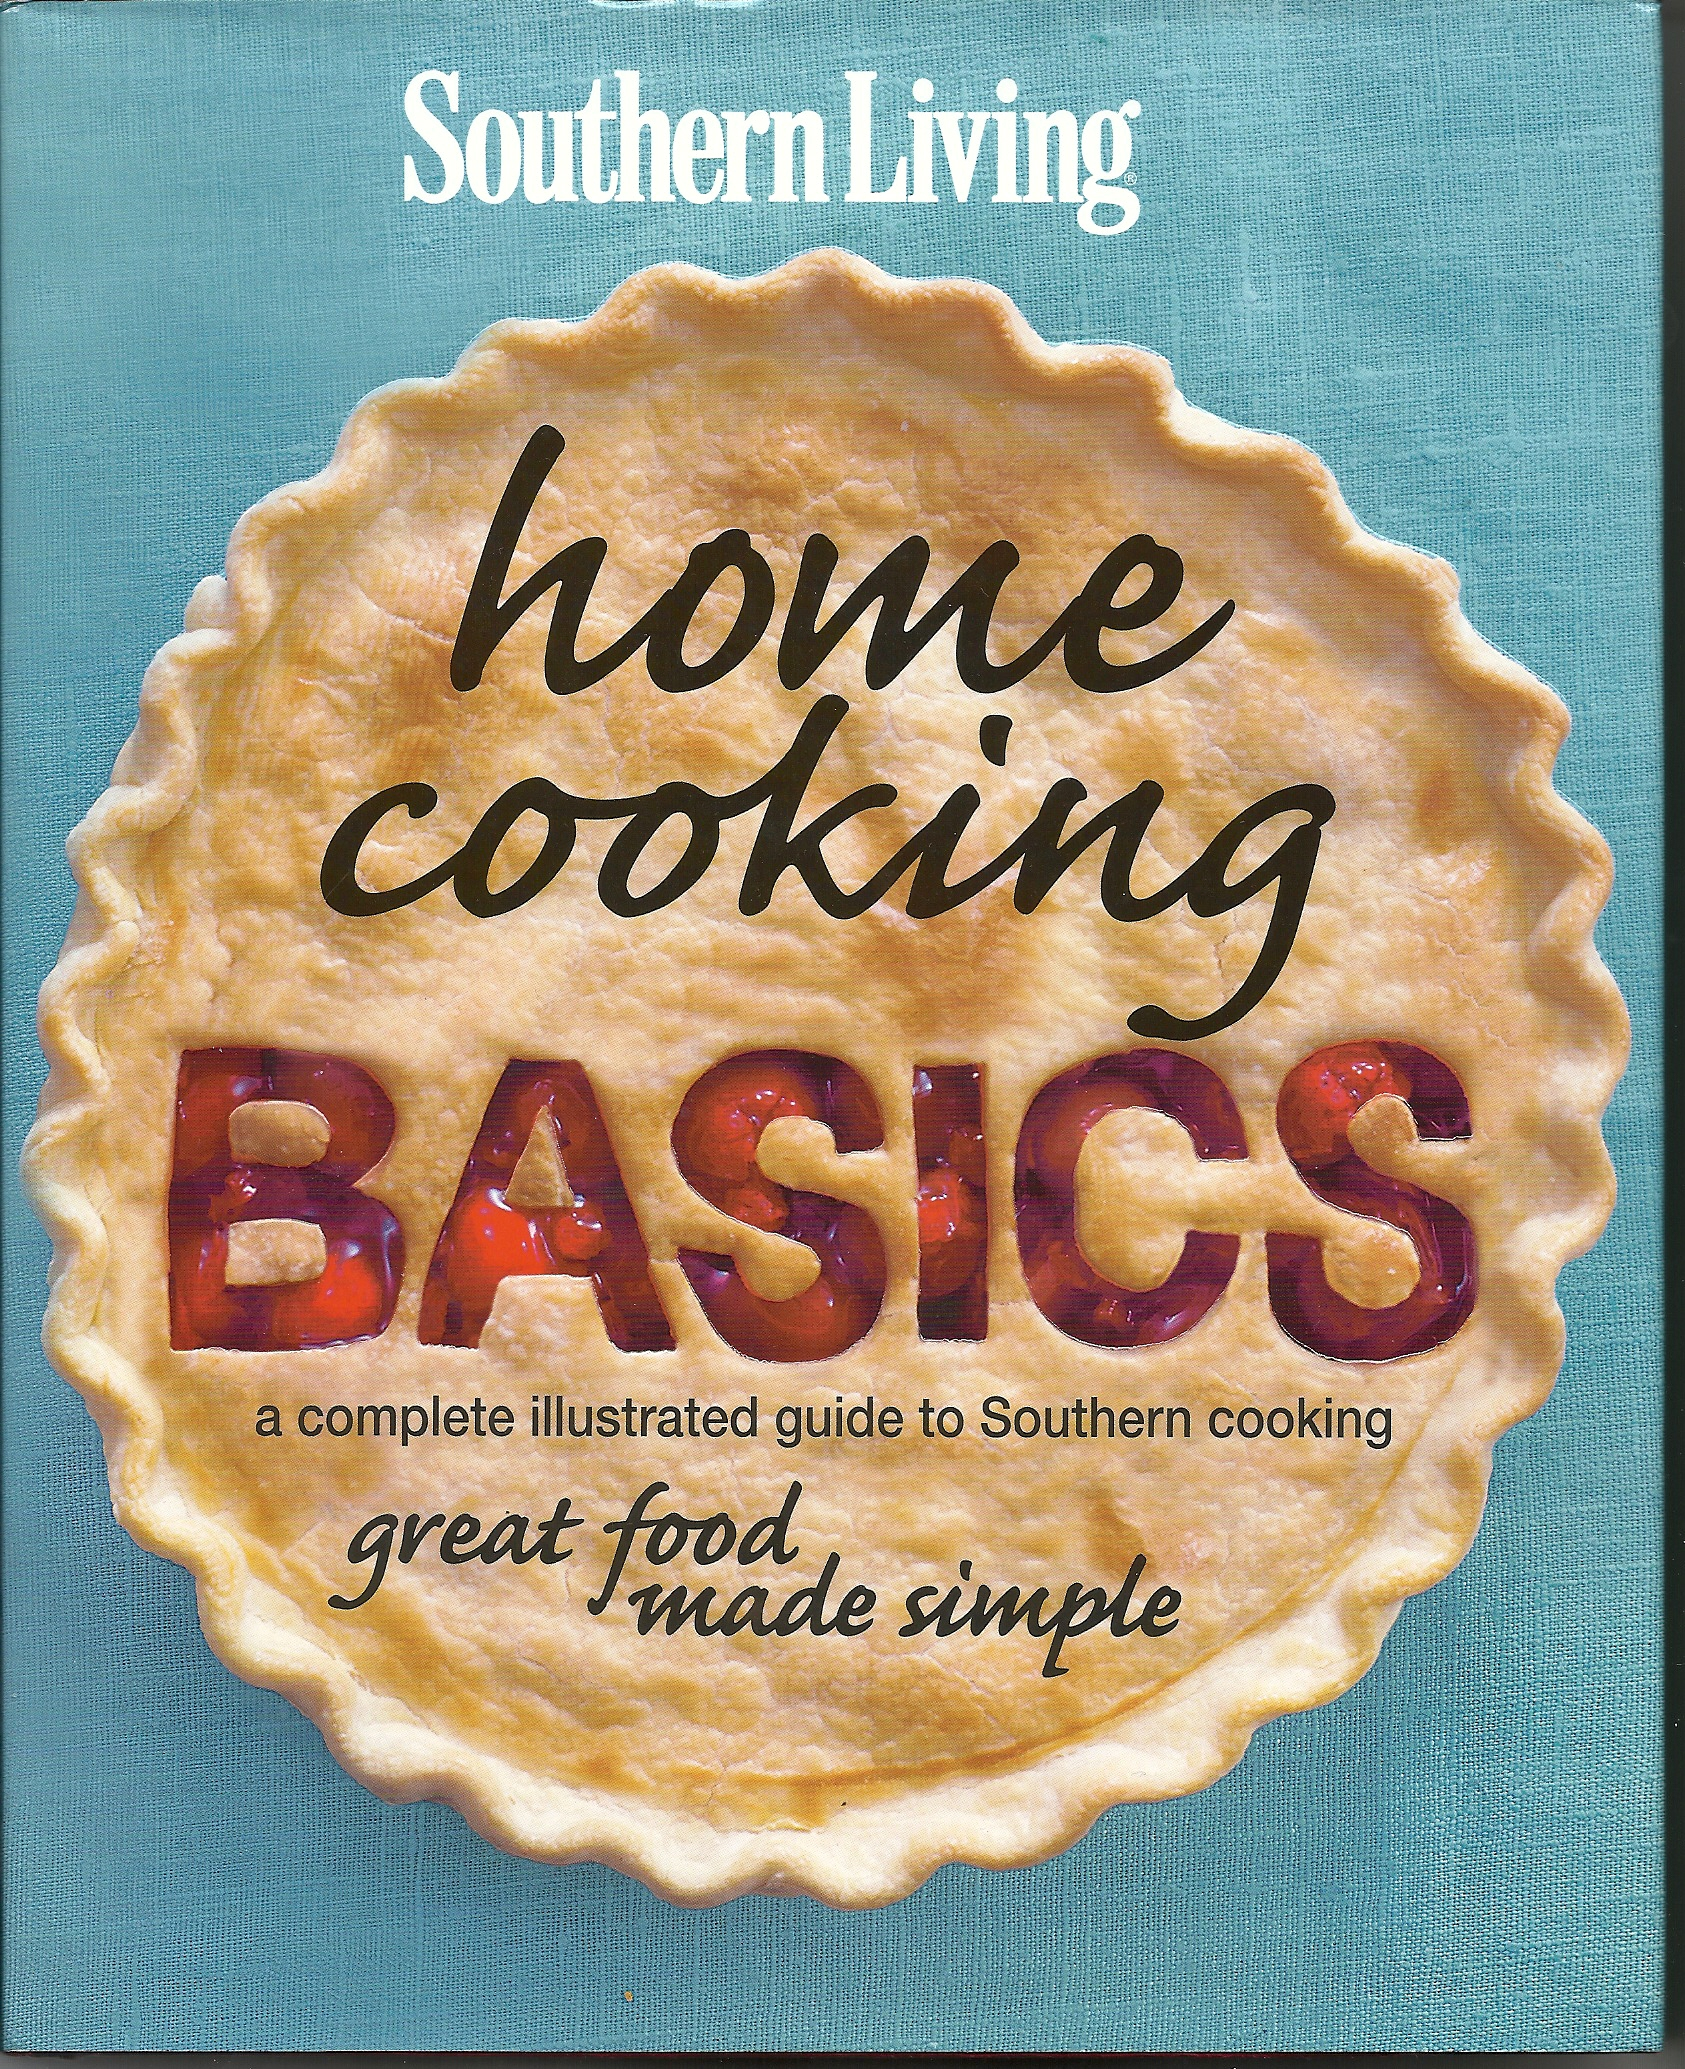 Southern_Living_Basics_Cookbook cover.jpg